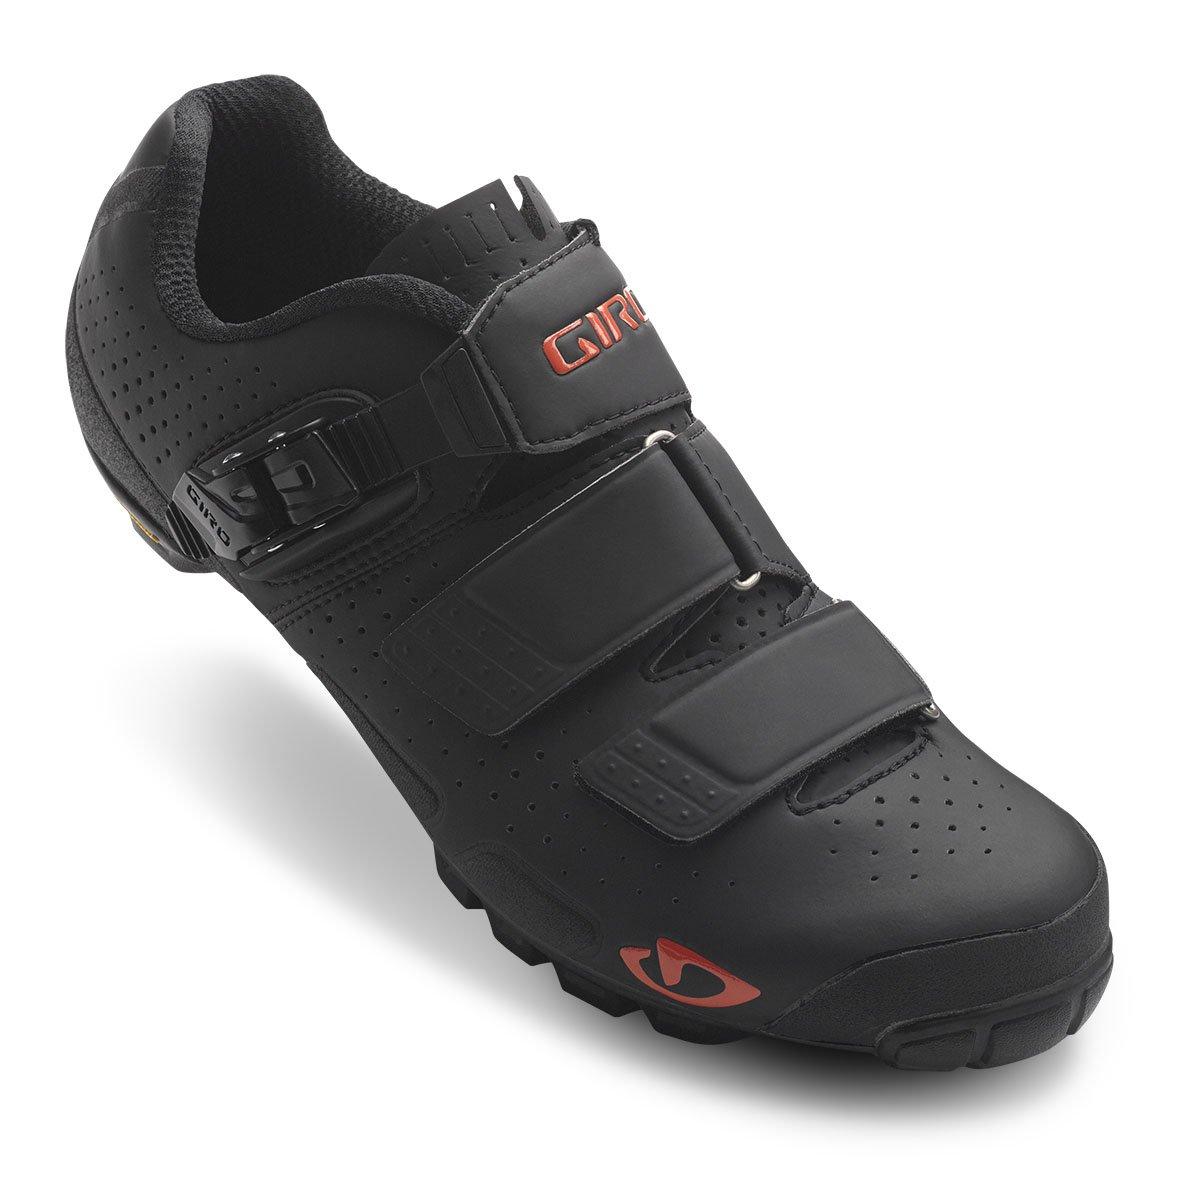 Giro メンズ Giro B00NESPEEC 40|ブラック ブラック 40